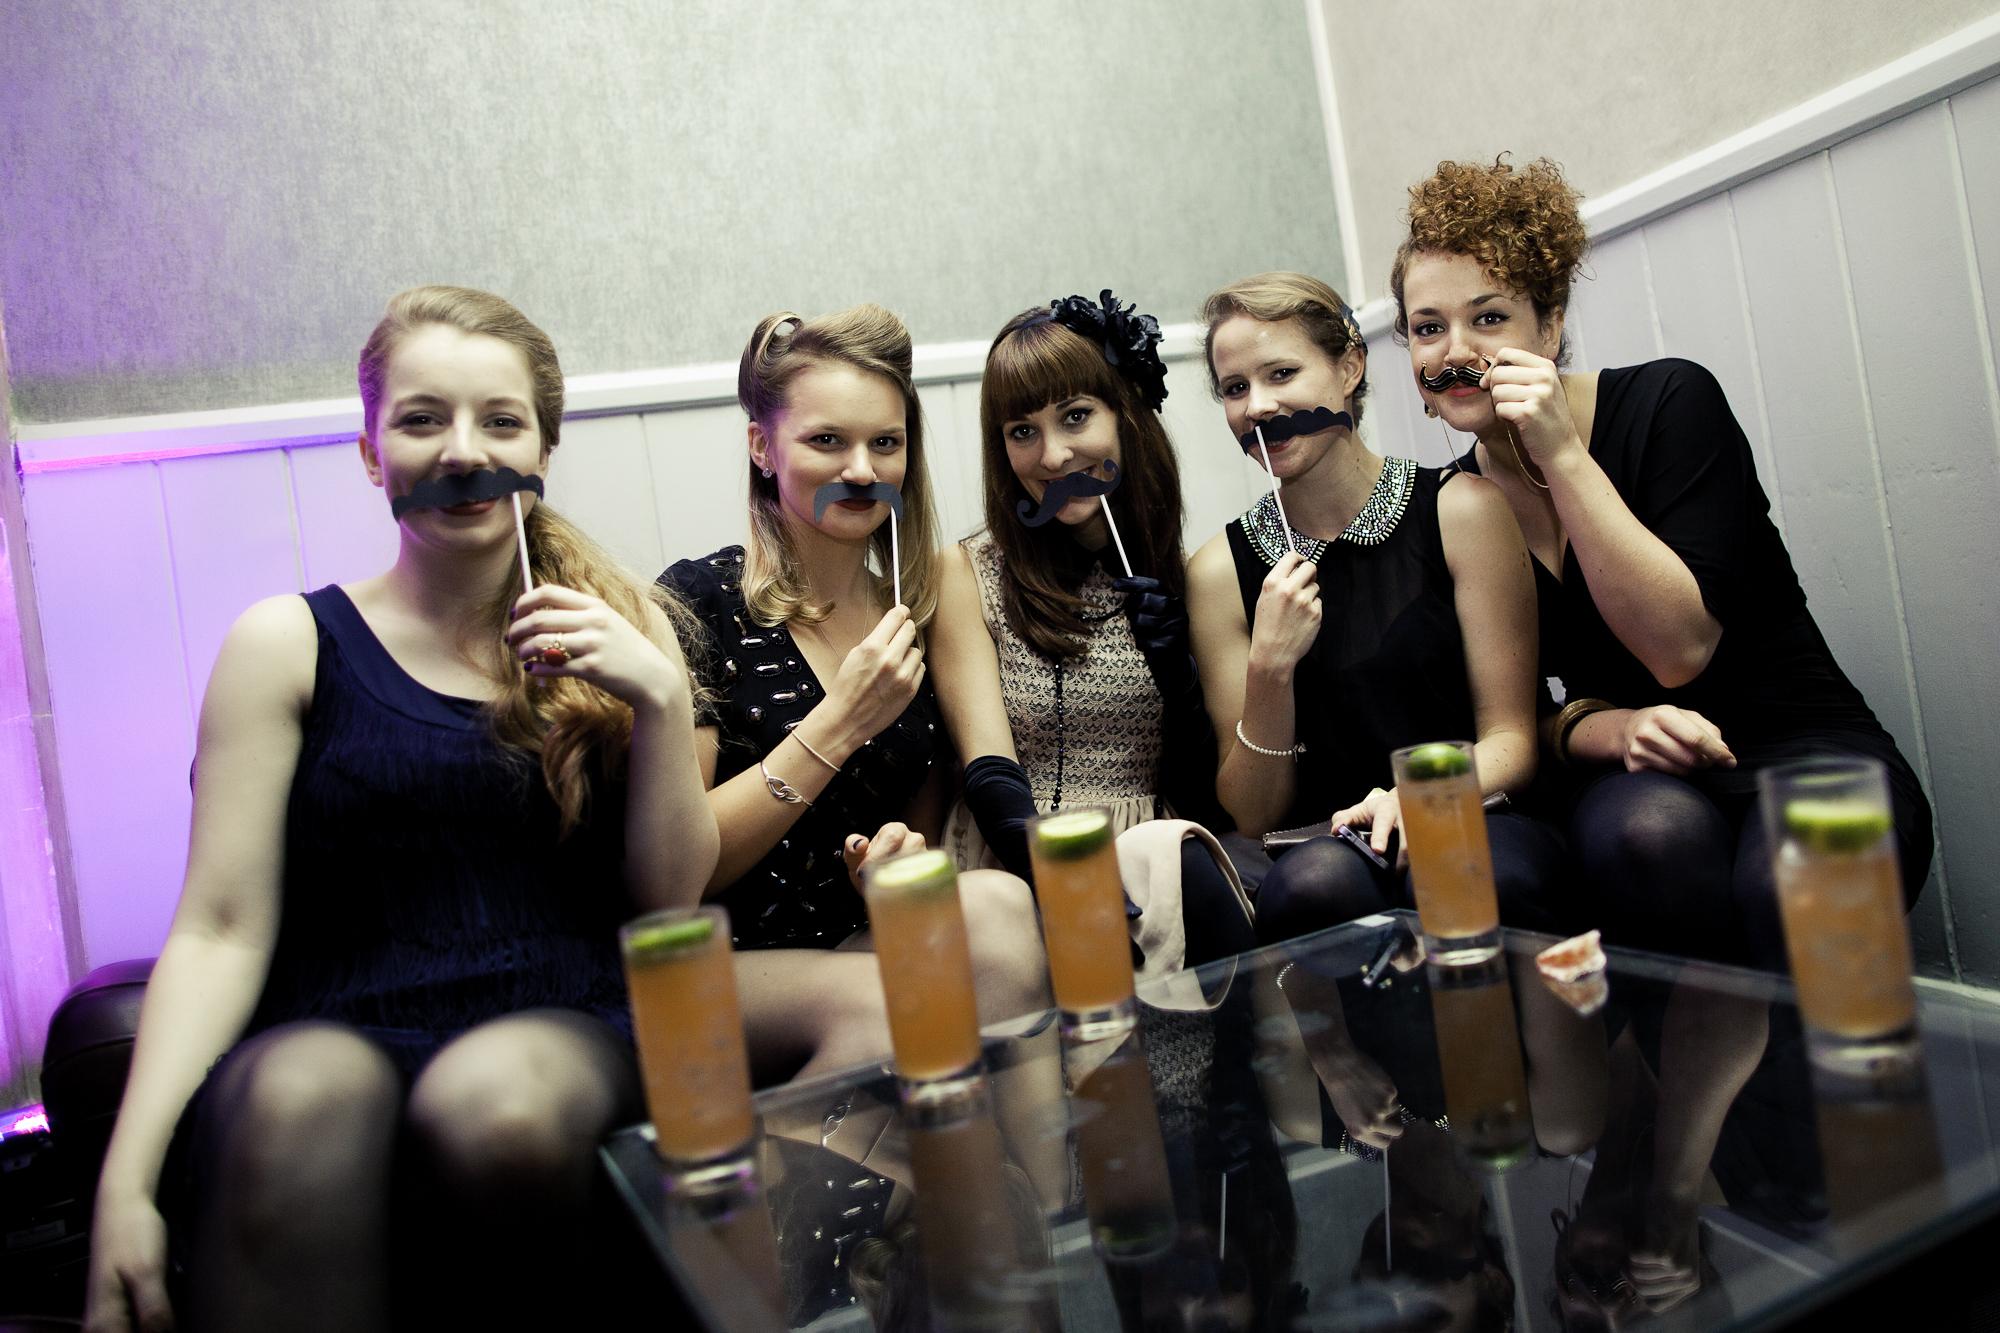 Lipstick & Moustaches